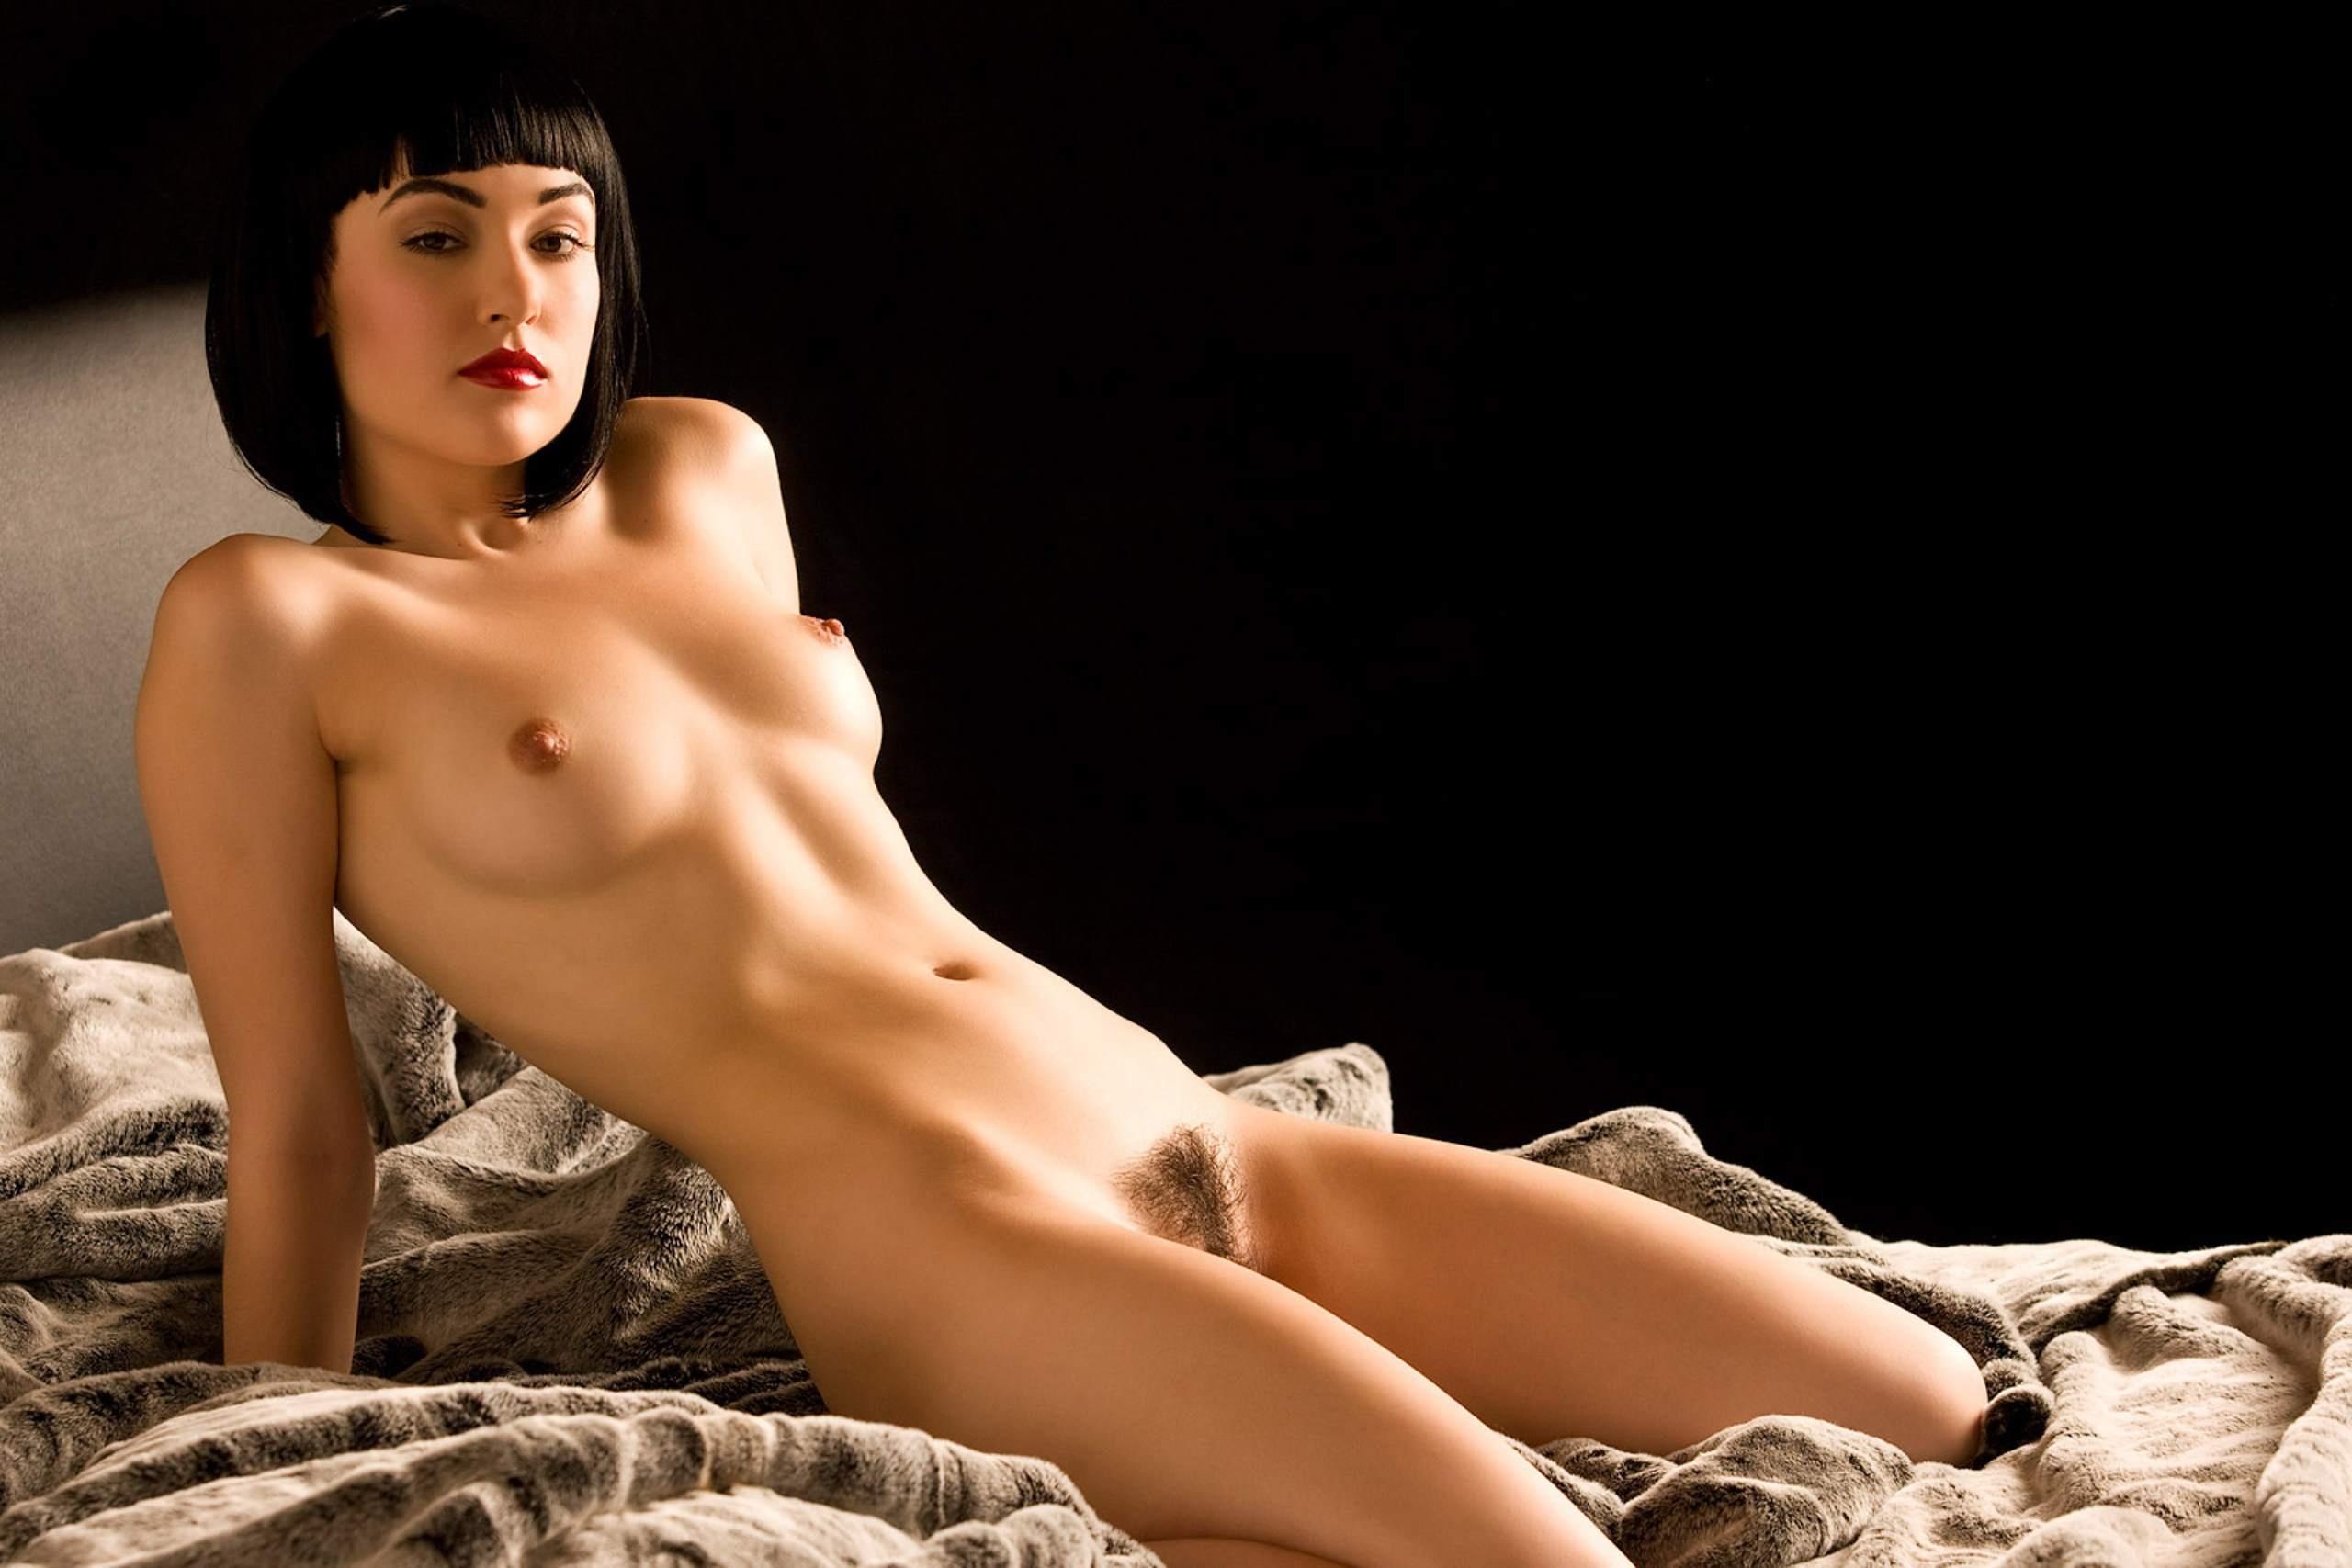 sasha gray nude pictures